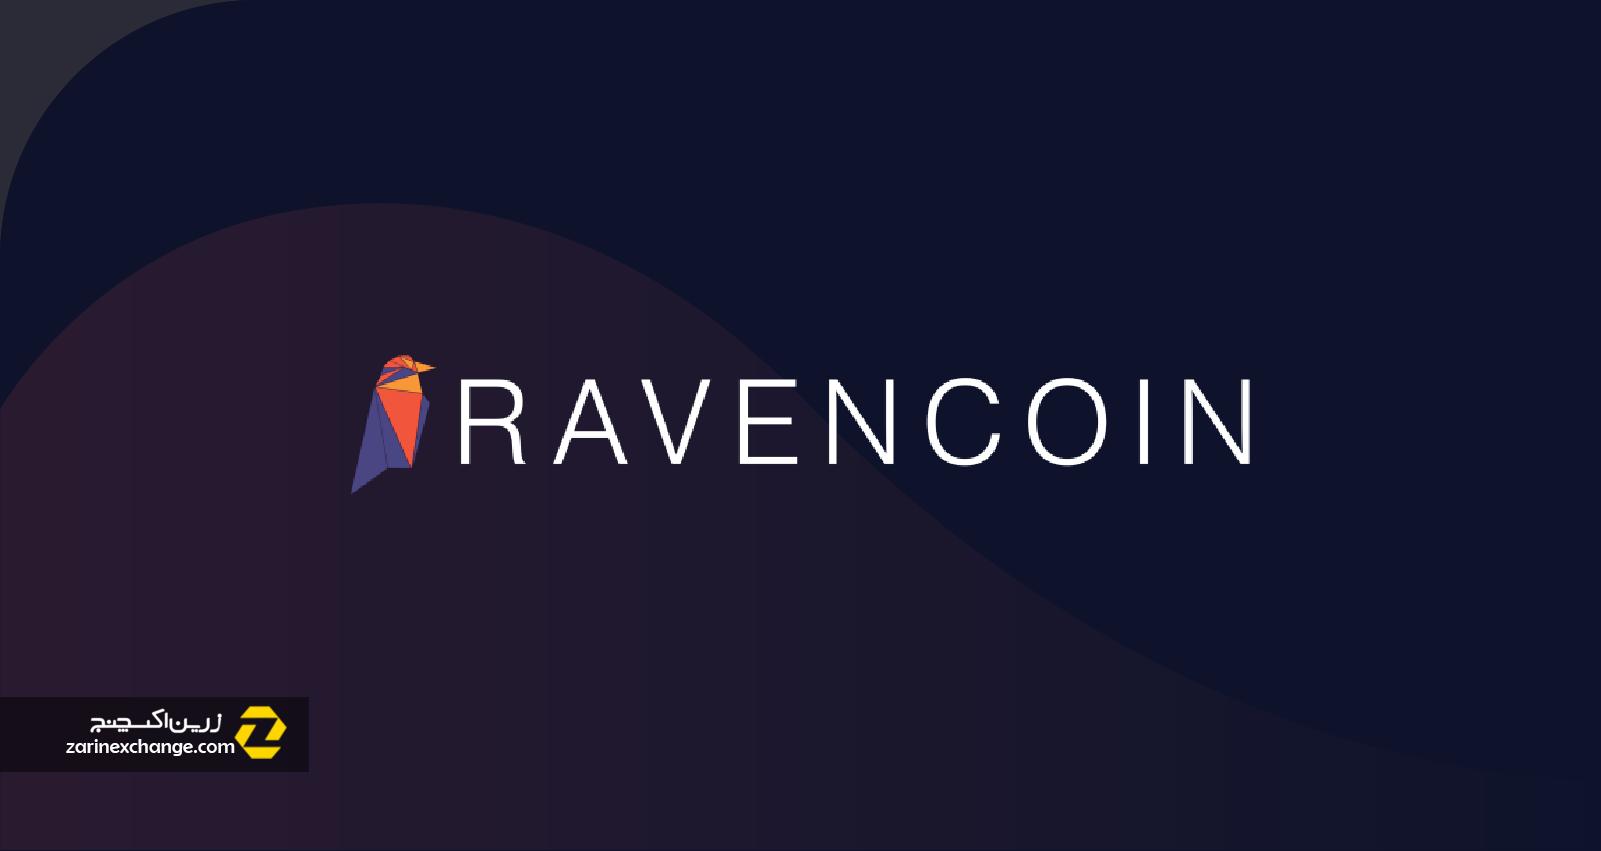 RavenCoin چیست؟ +کاربردها و مزایای این ارز دیجیتال